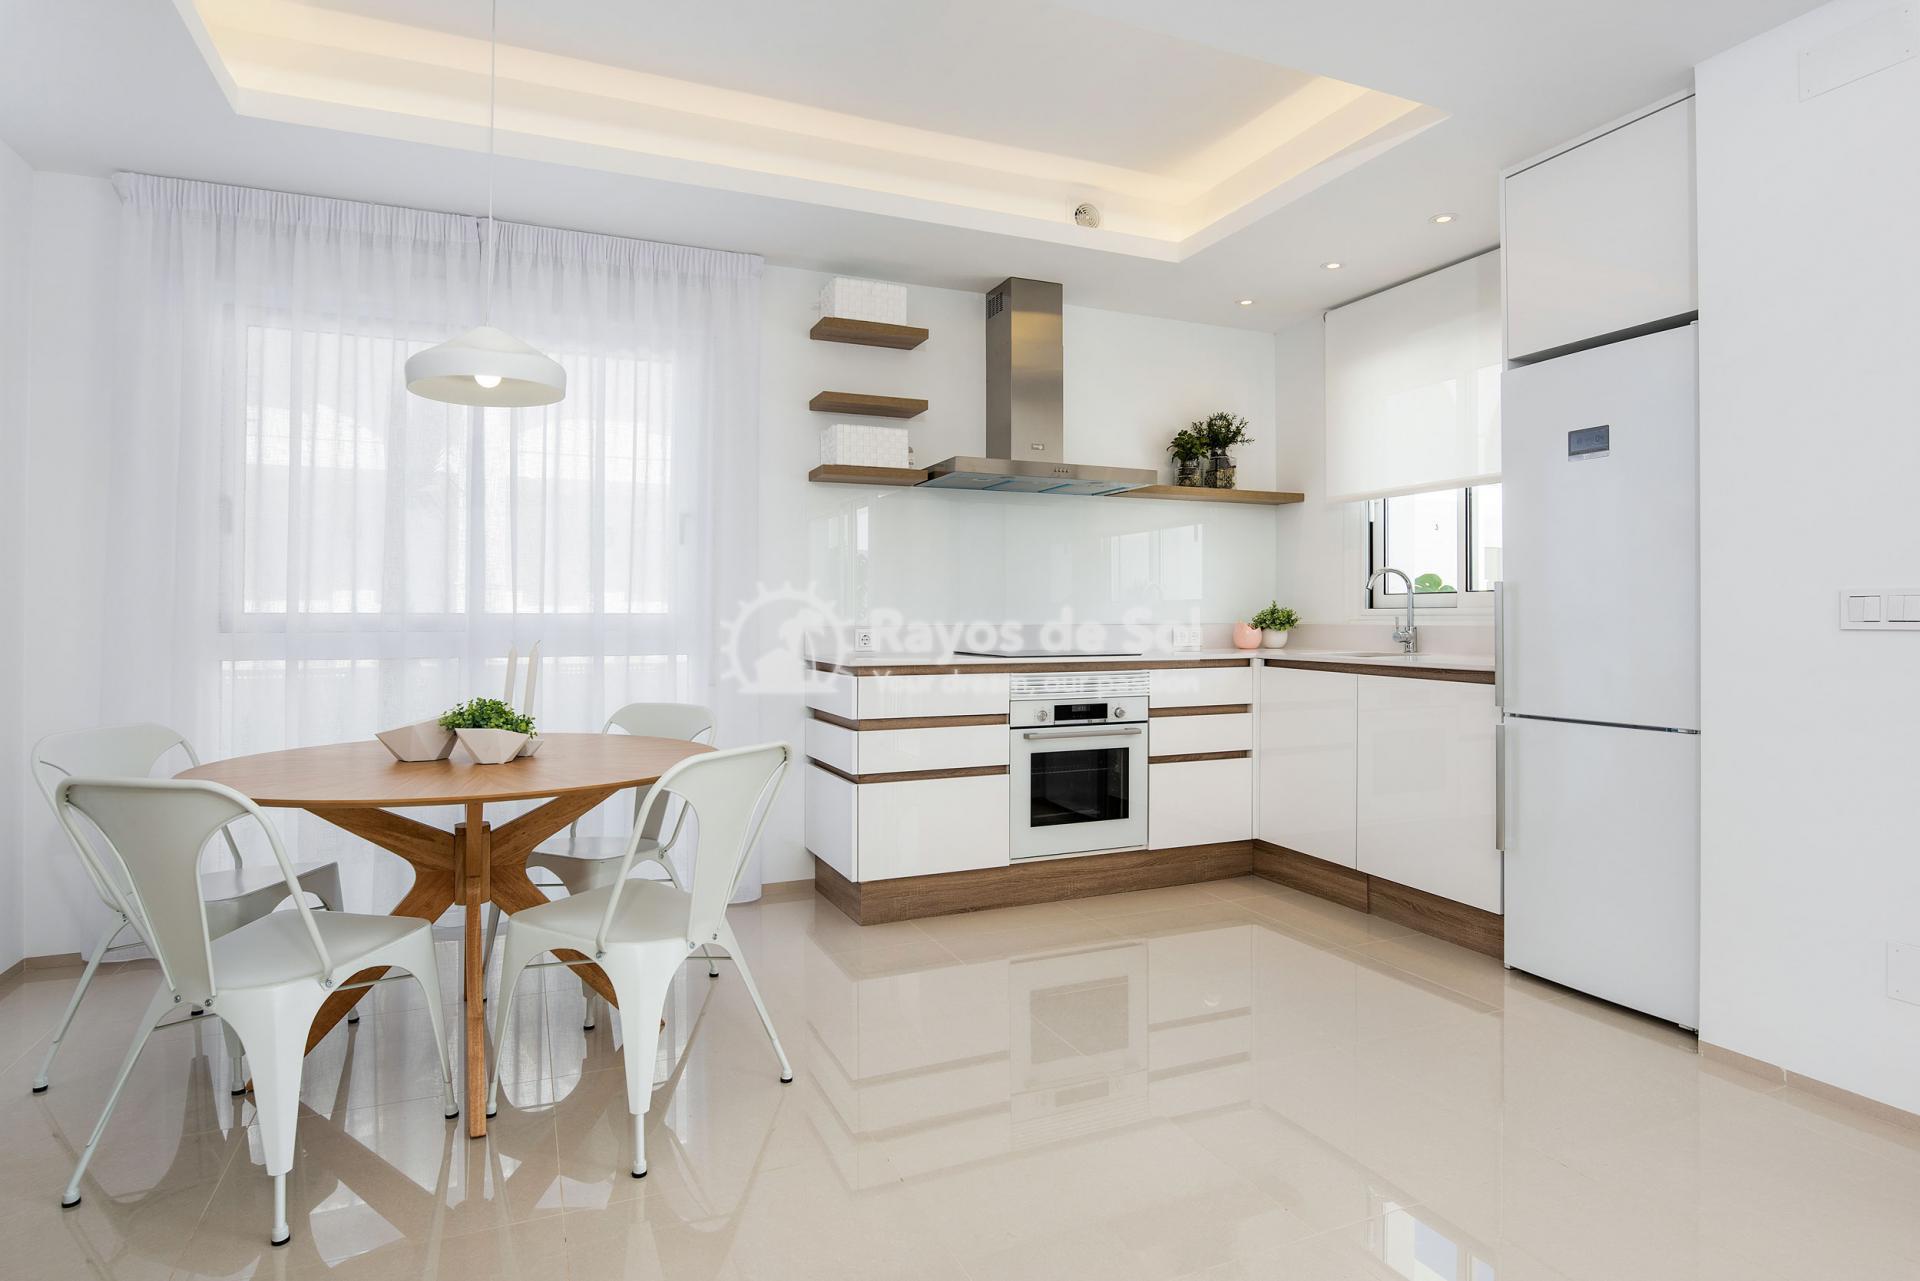 Ground floor apartment  in Doña Pepa, Ciudad Quesada, Costa Blanca (Allegra-olivos-bg-3-2) - 6